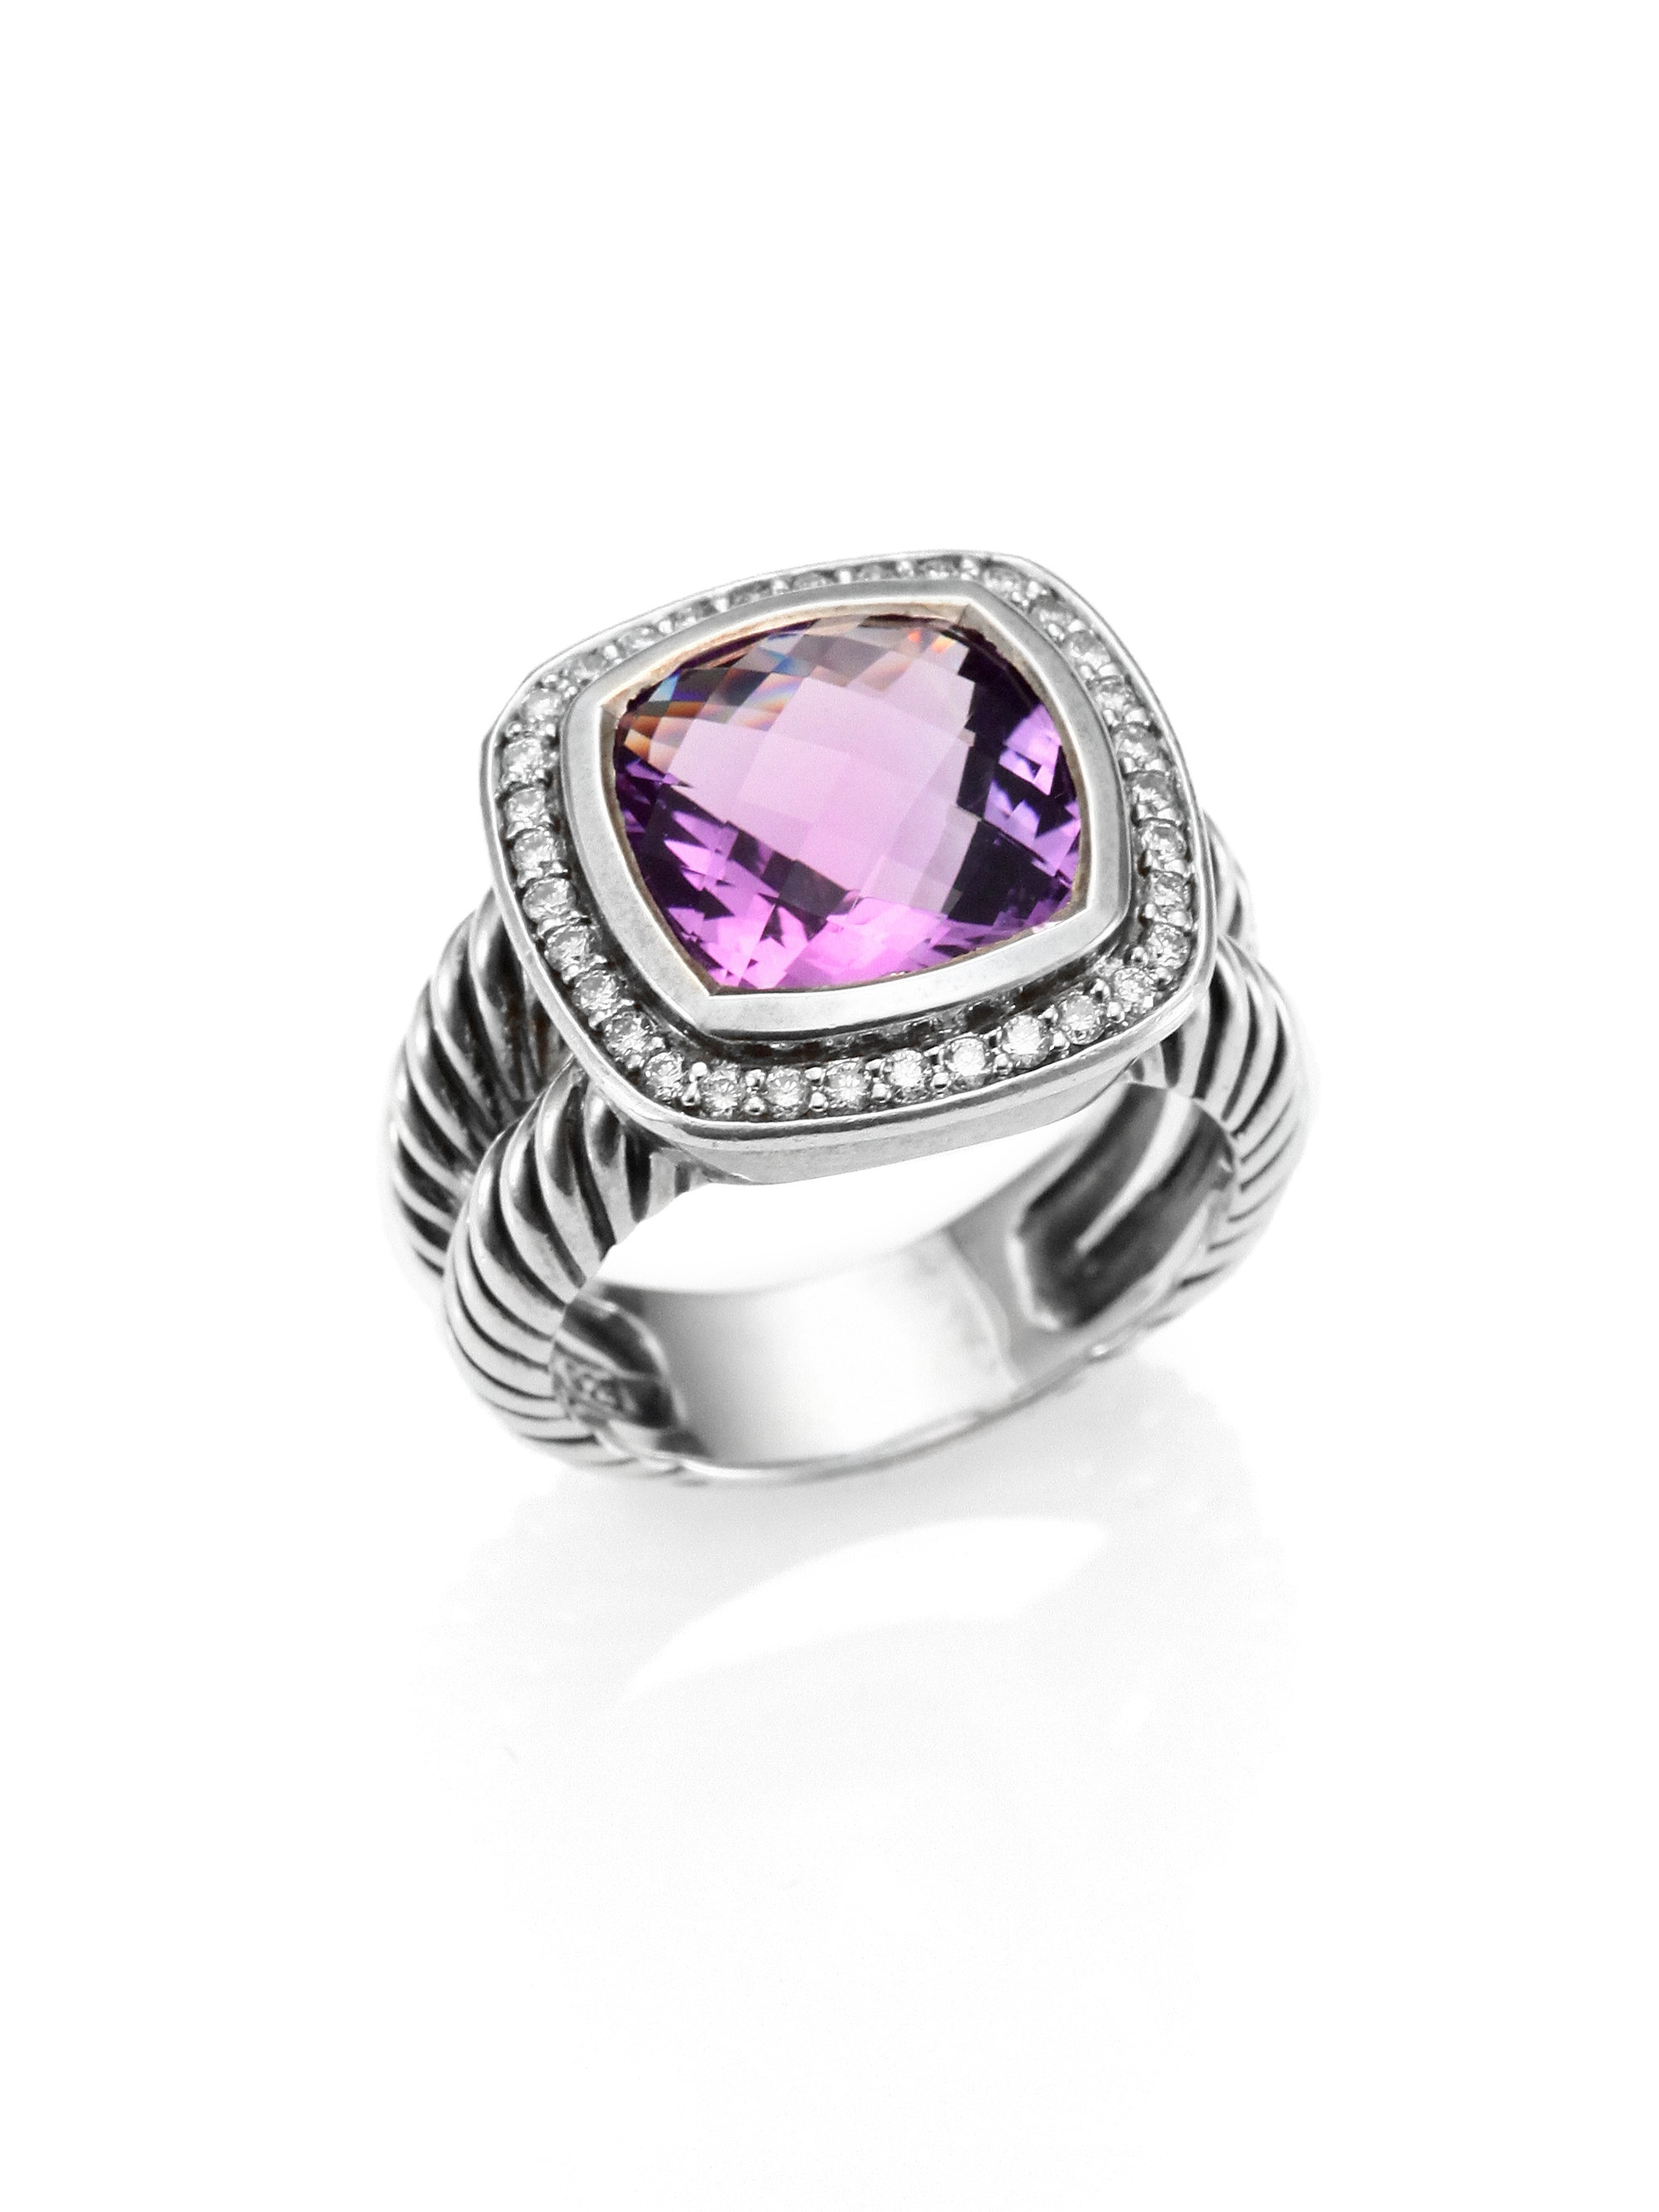 david yurman rings gold silver fashion rings lyst